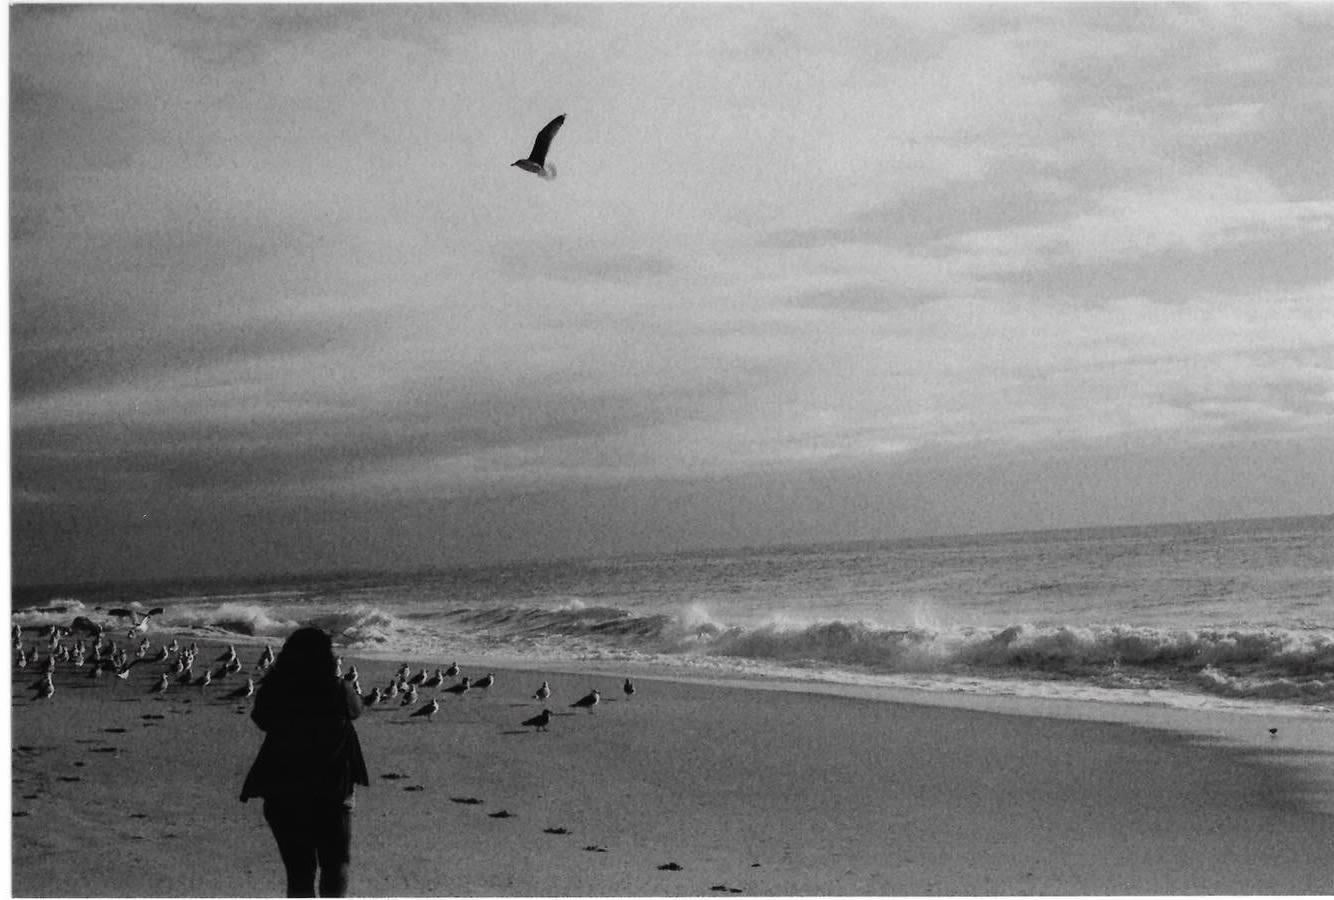 film, photo by Vanessa Serna